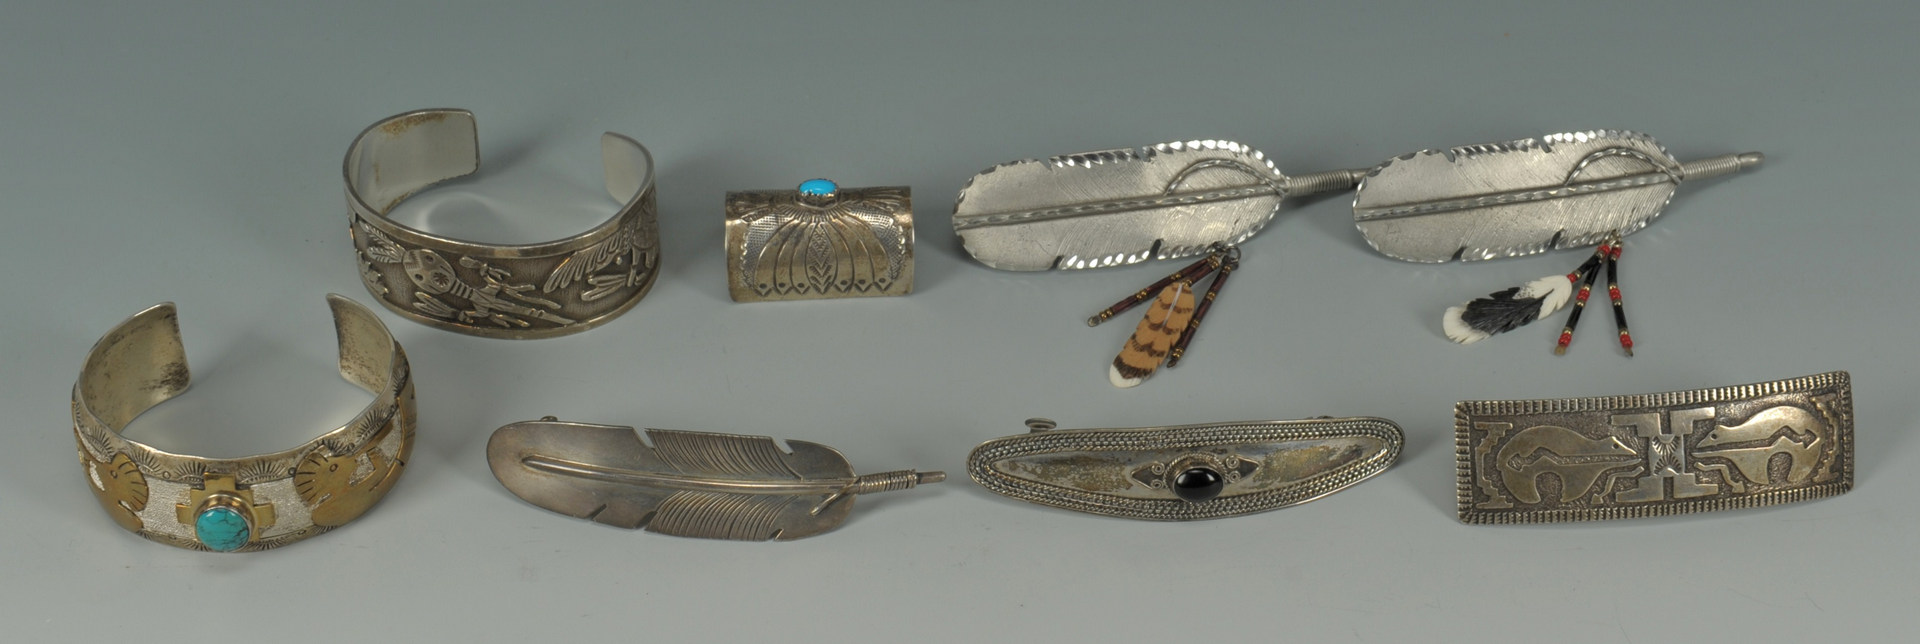 Lot 385: Native American Silver Bracelets & Hair Clips, 8 p